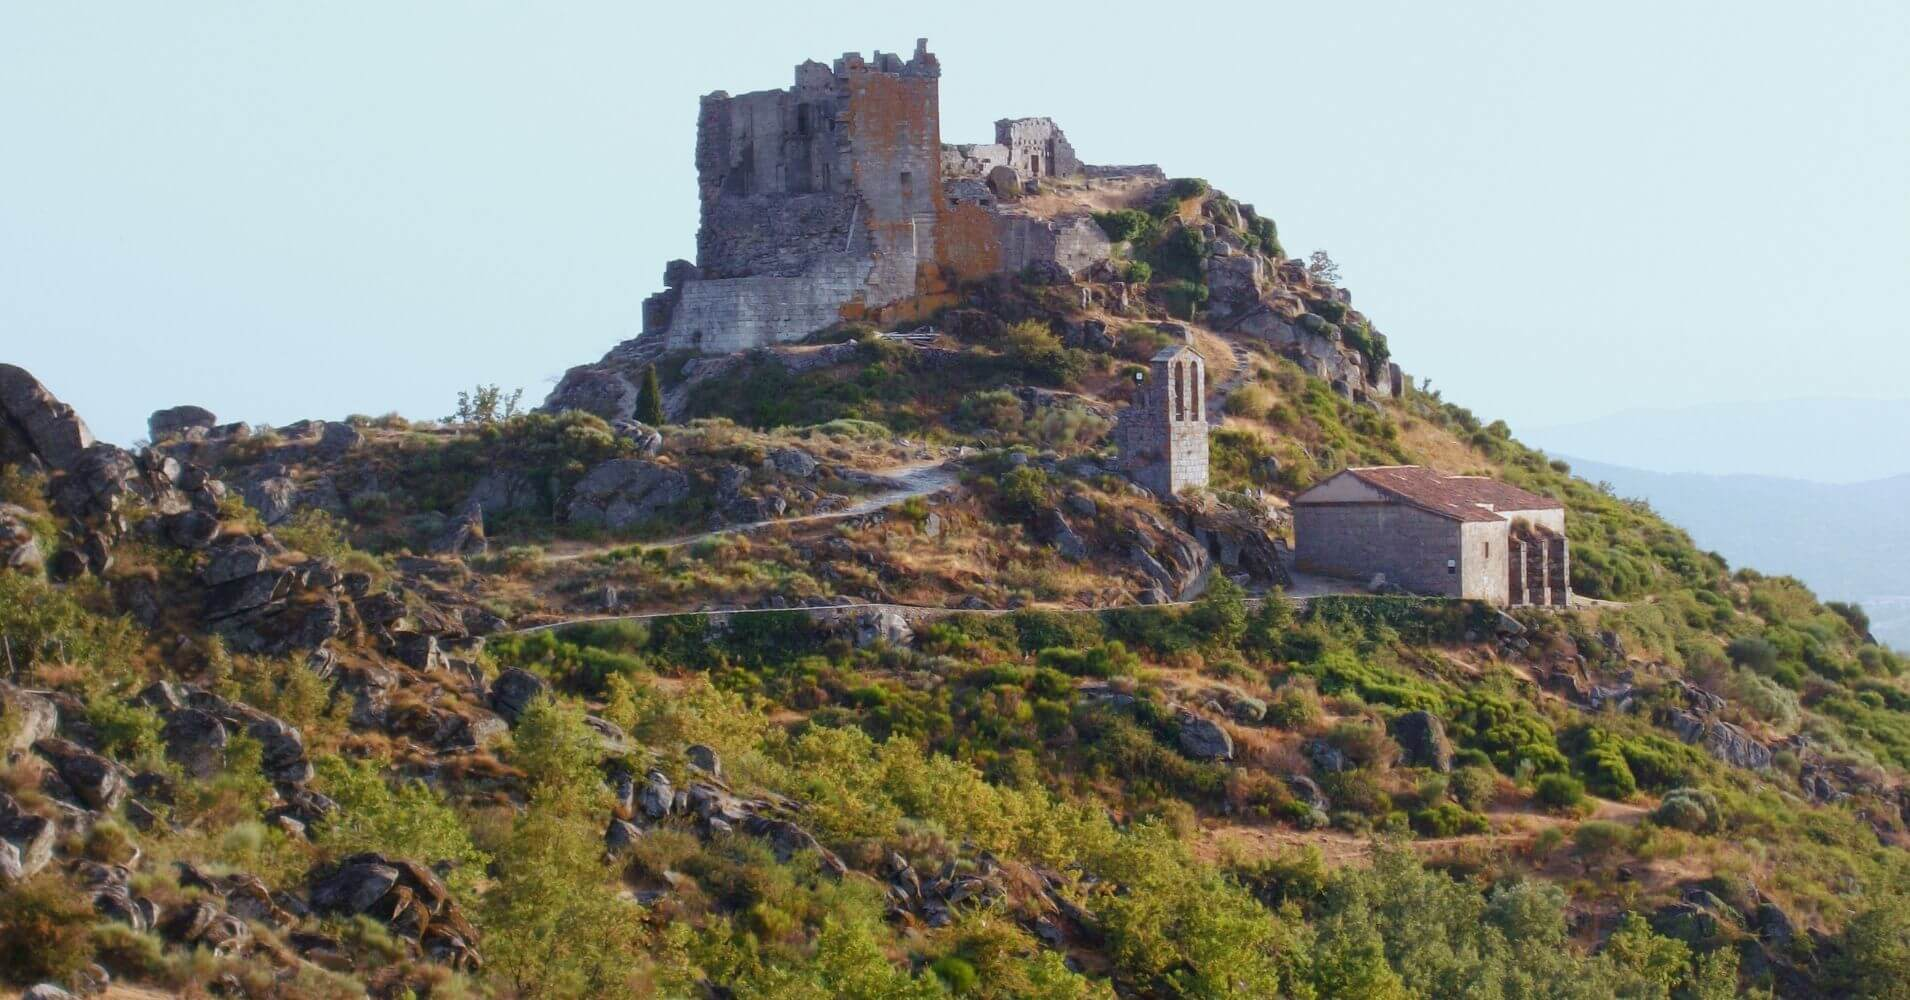 Valle de Jálama. Misterio de A Fala. San Martín de Trevejo en Cáceres. Extremadura.